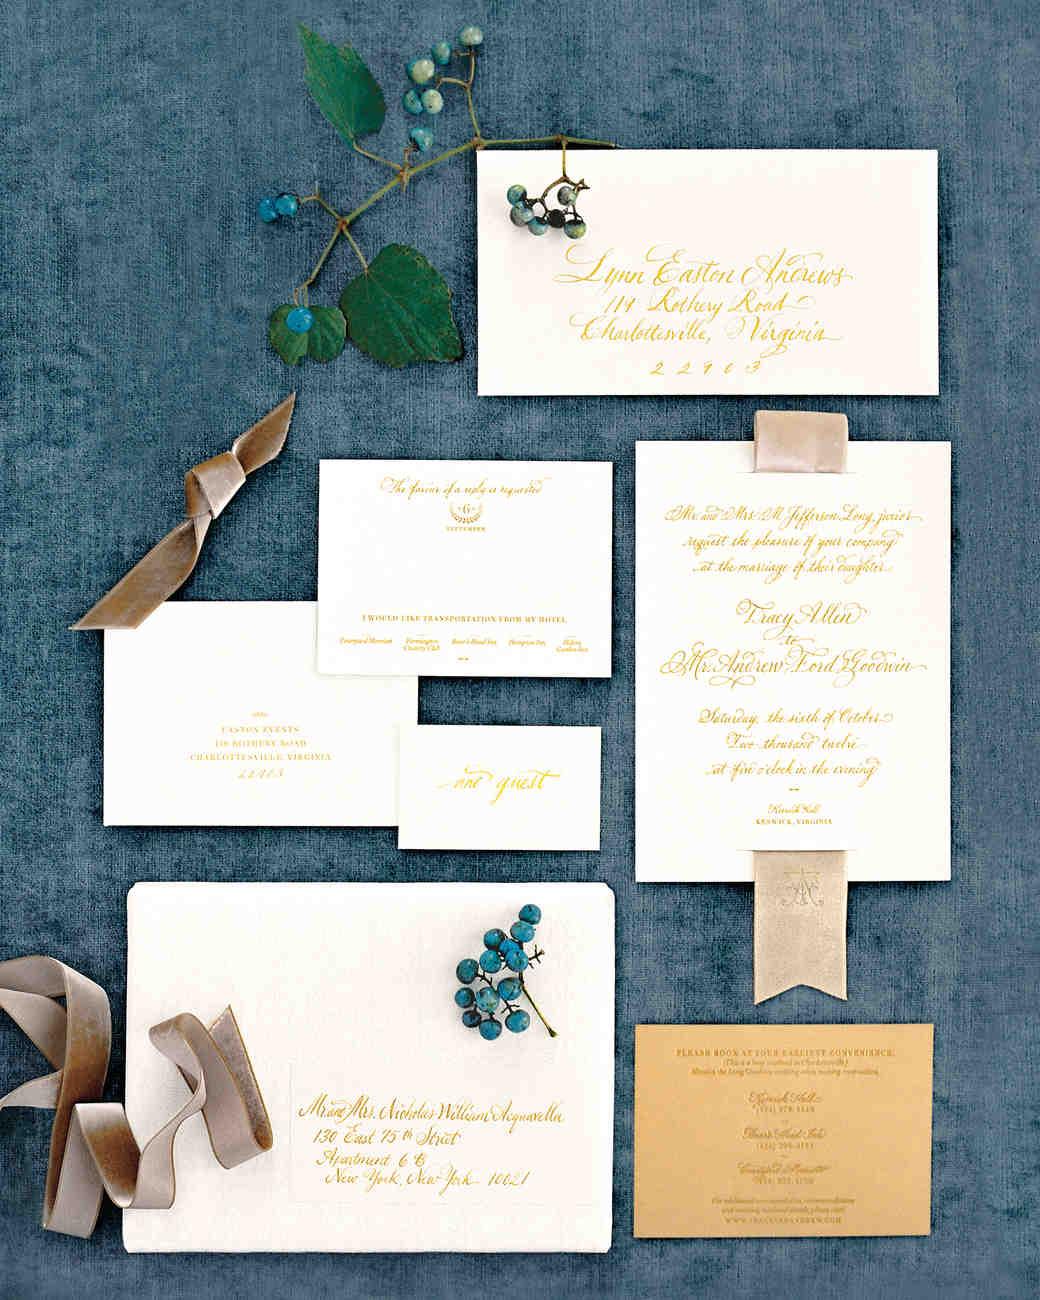 invitation-ribbon-004188-r1-01-5comp-mwds110148.jpg